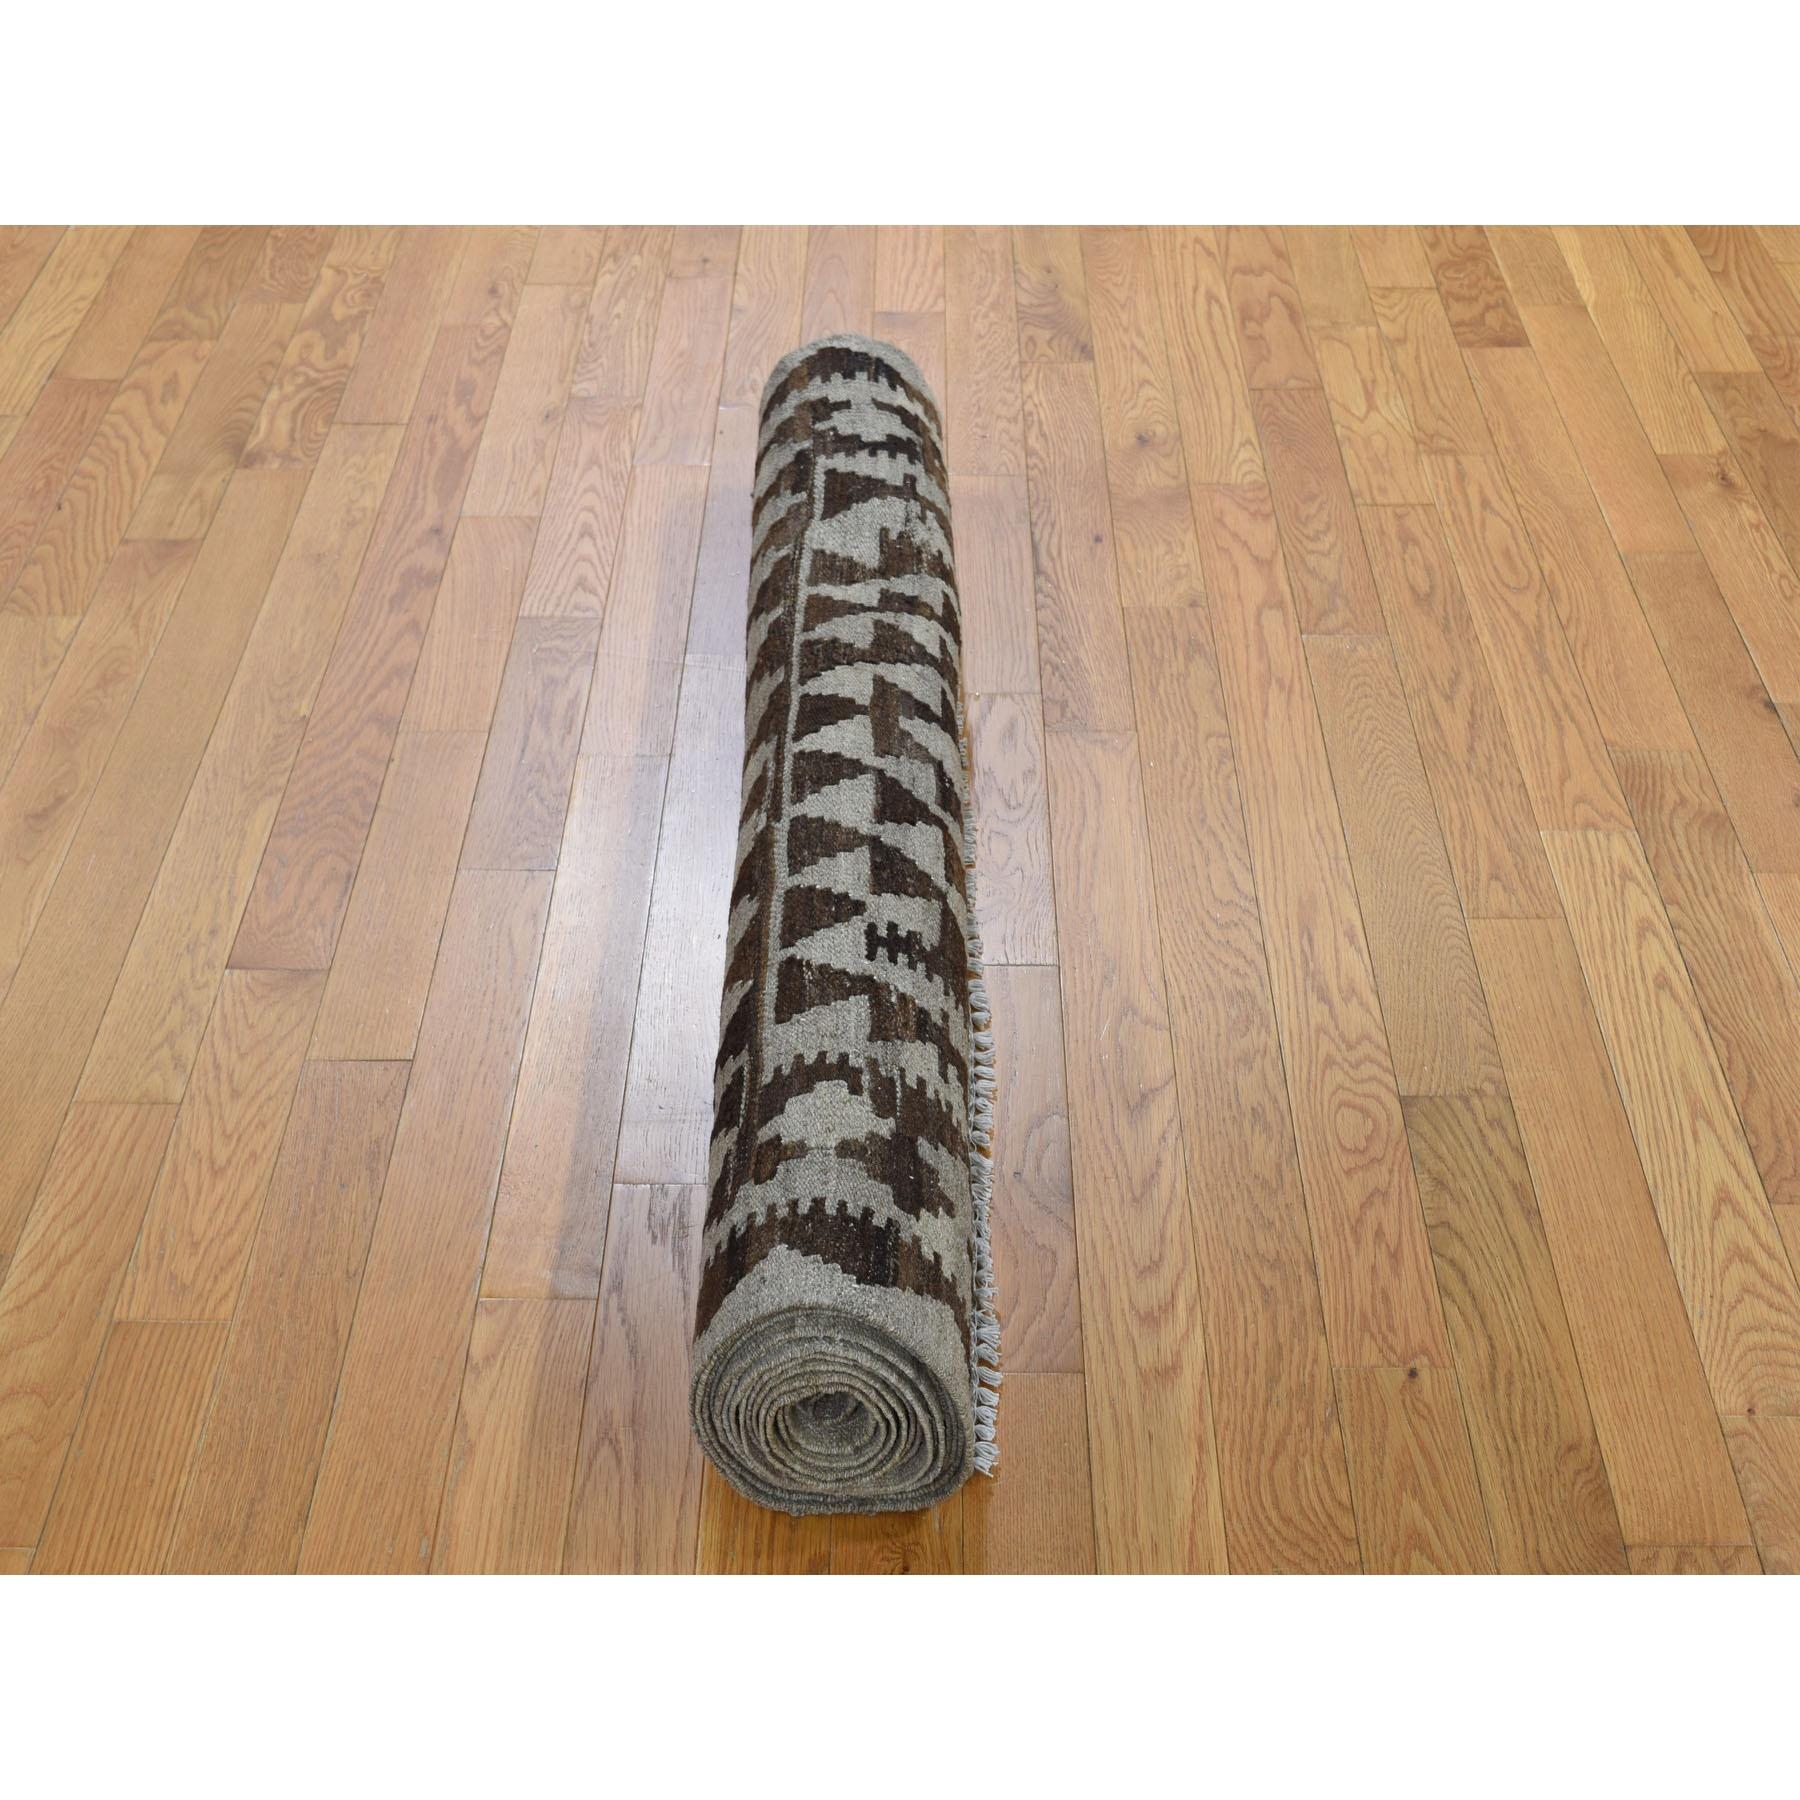 4-1 x16-4  Undyed Natural Wool Afghan Kilim Reversible XL Runner Hand Woven Oriental Rug